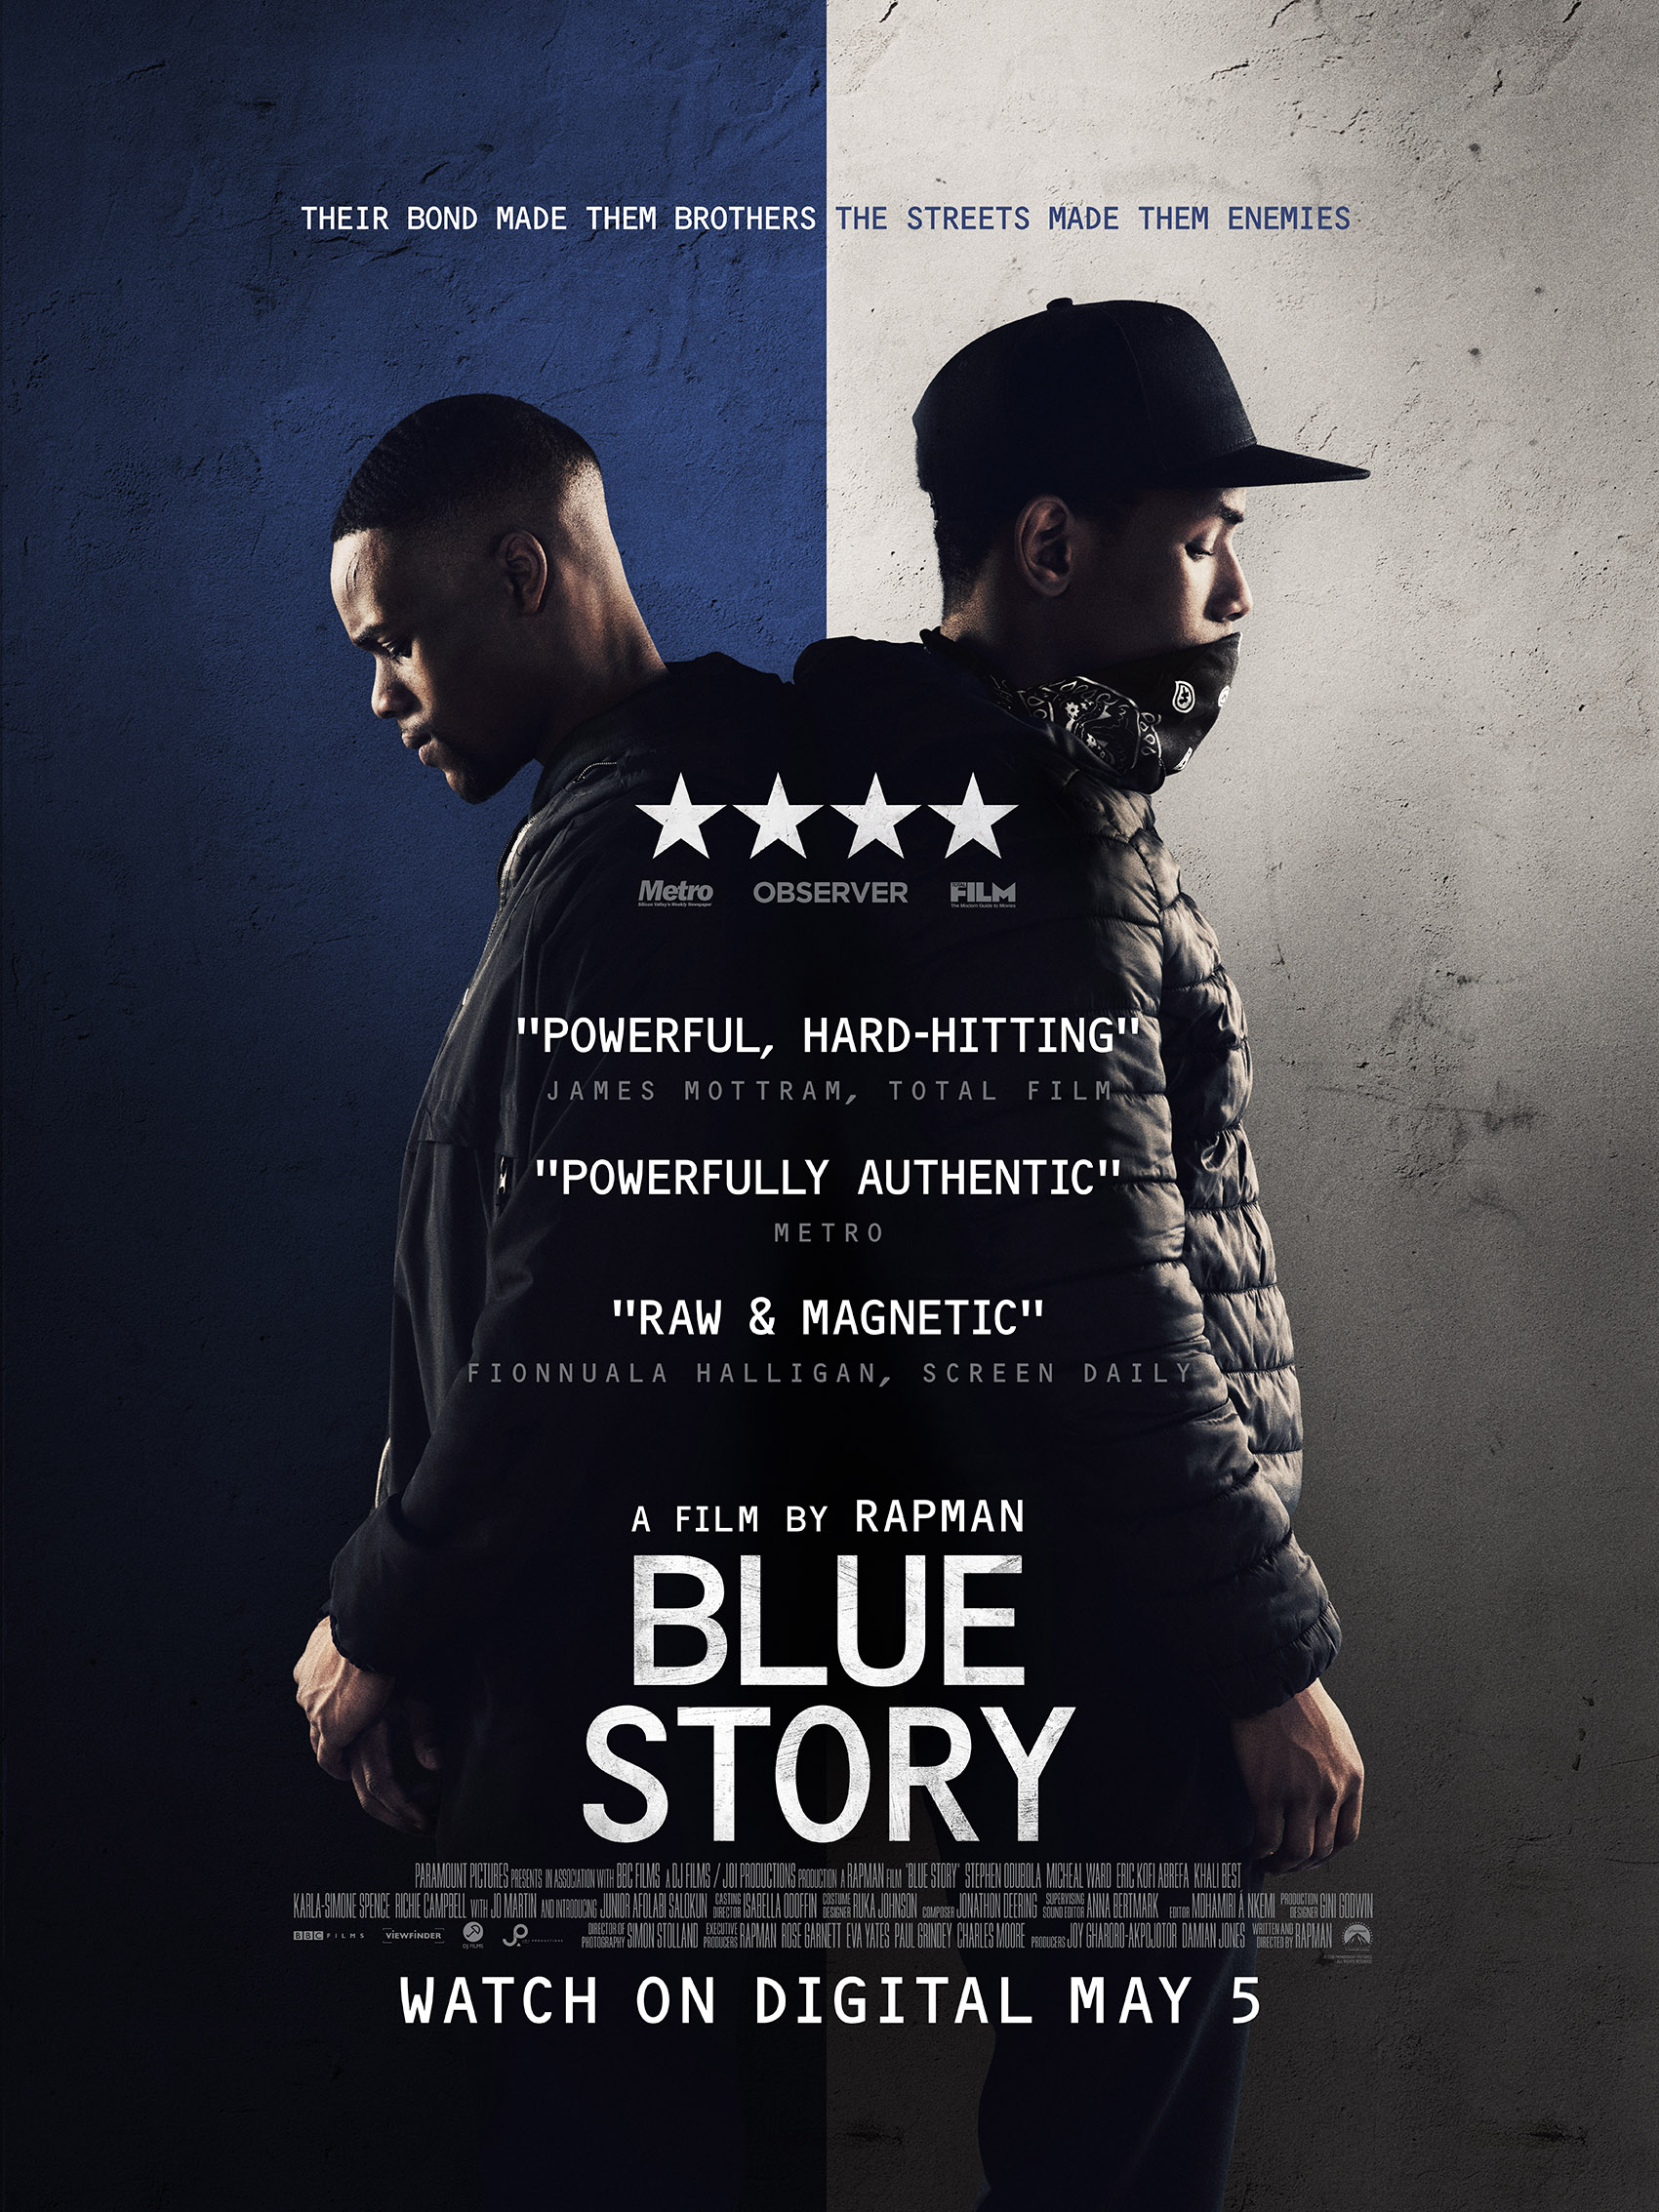 New Film: Blue Story Starring Stephen Odubola, Micheal Ward